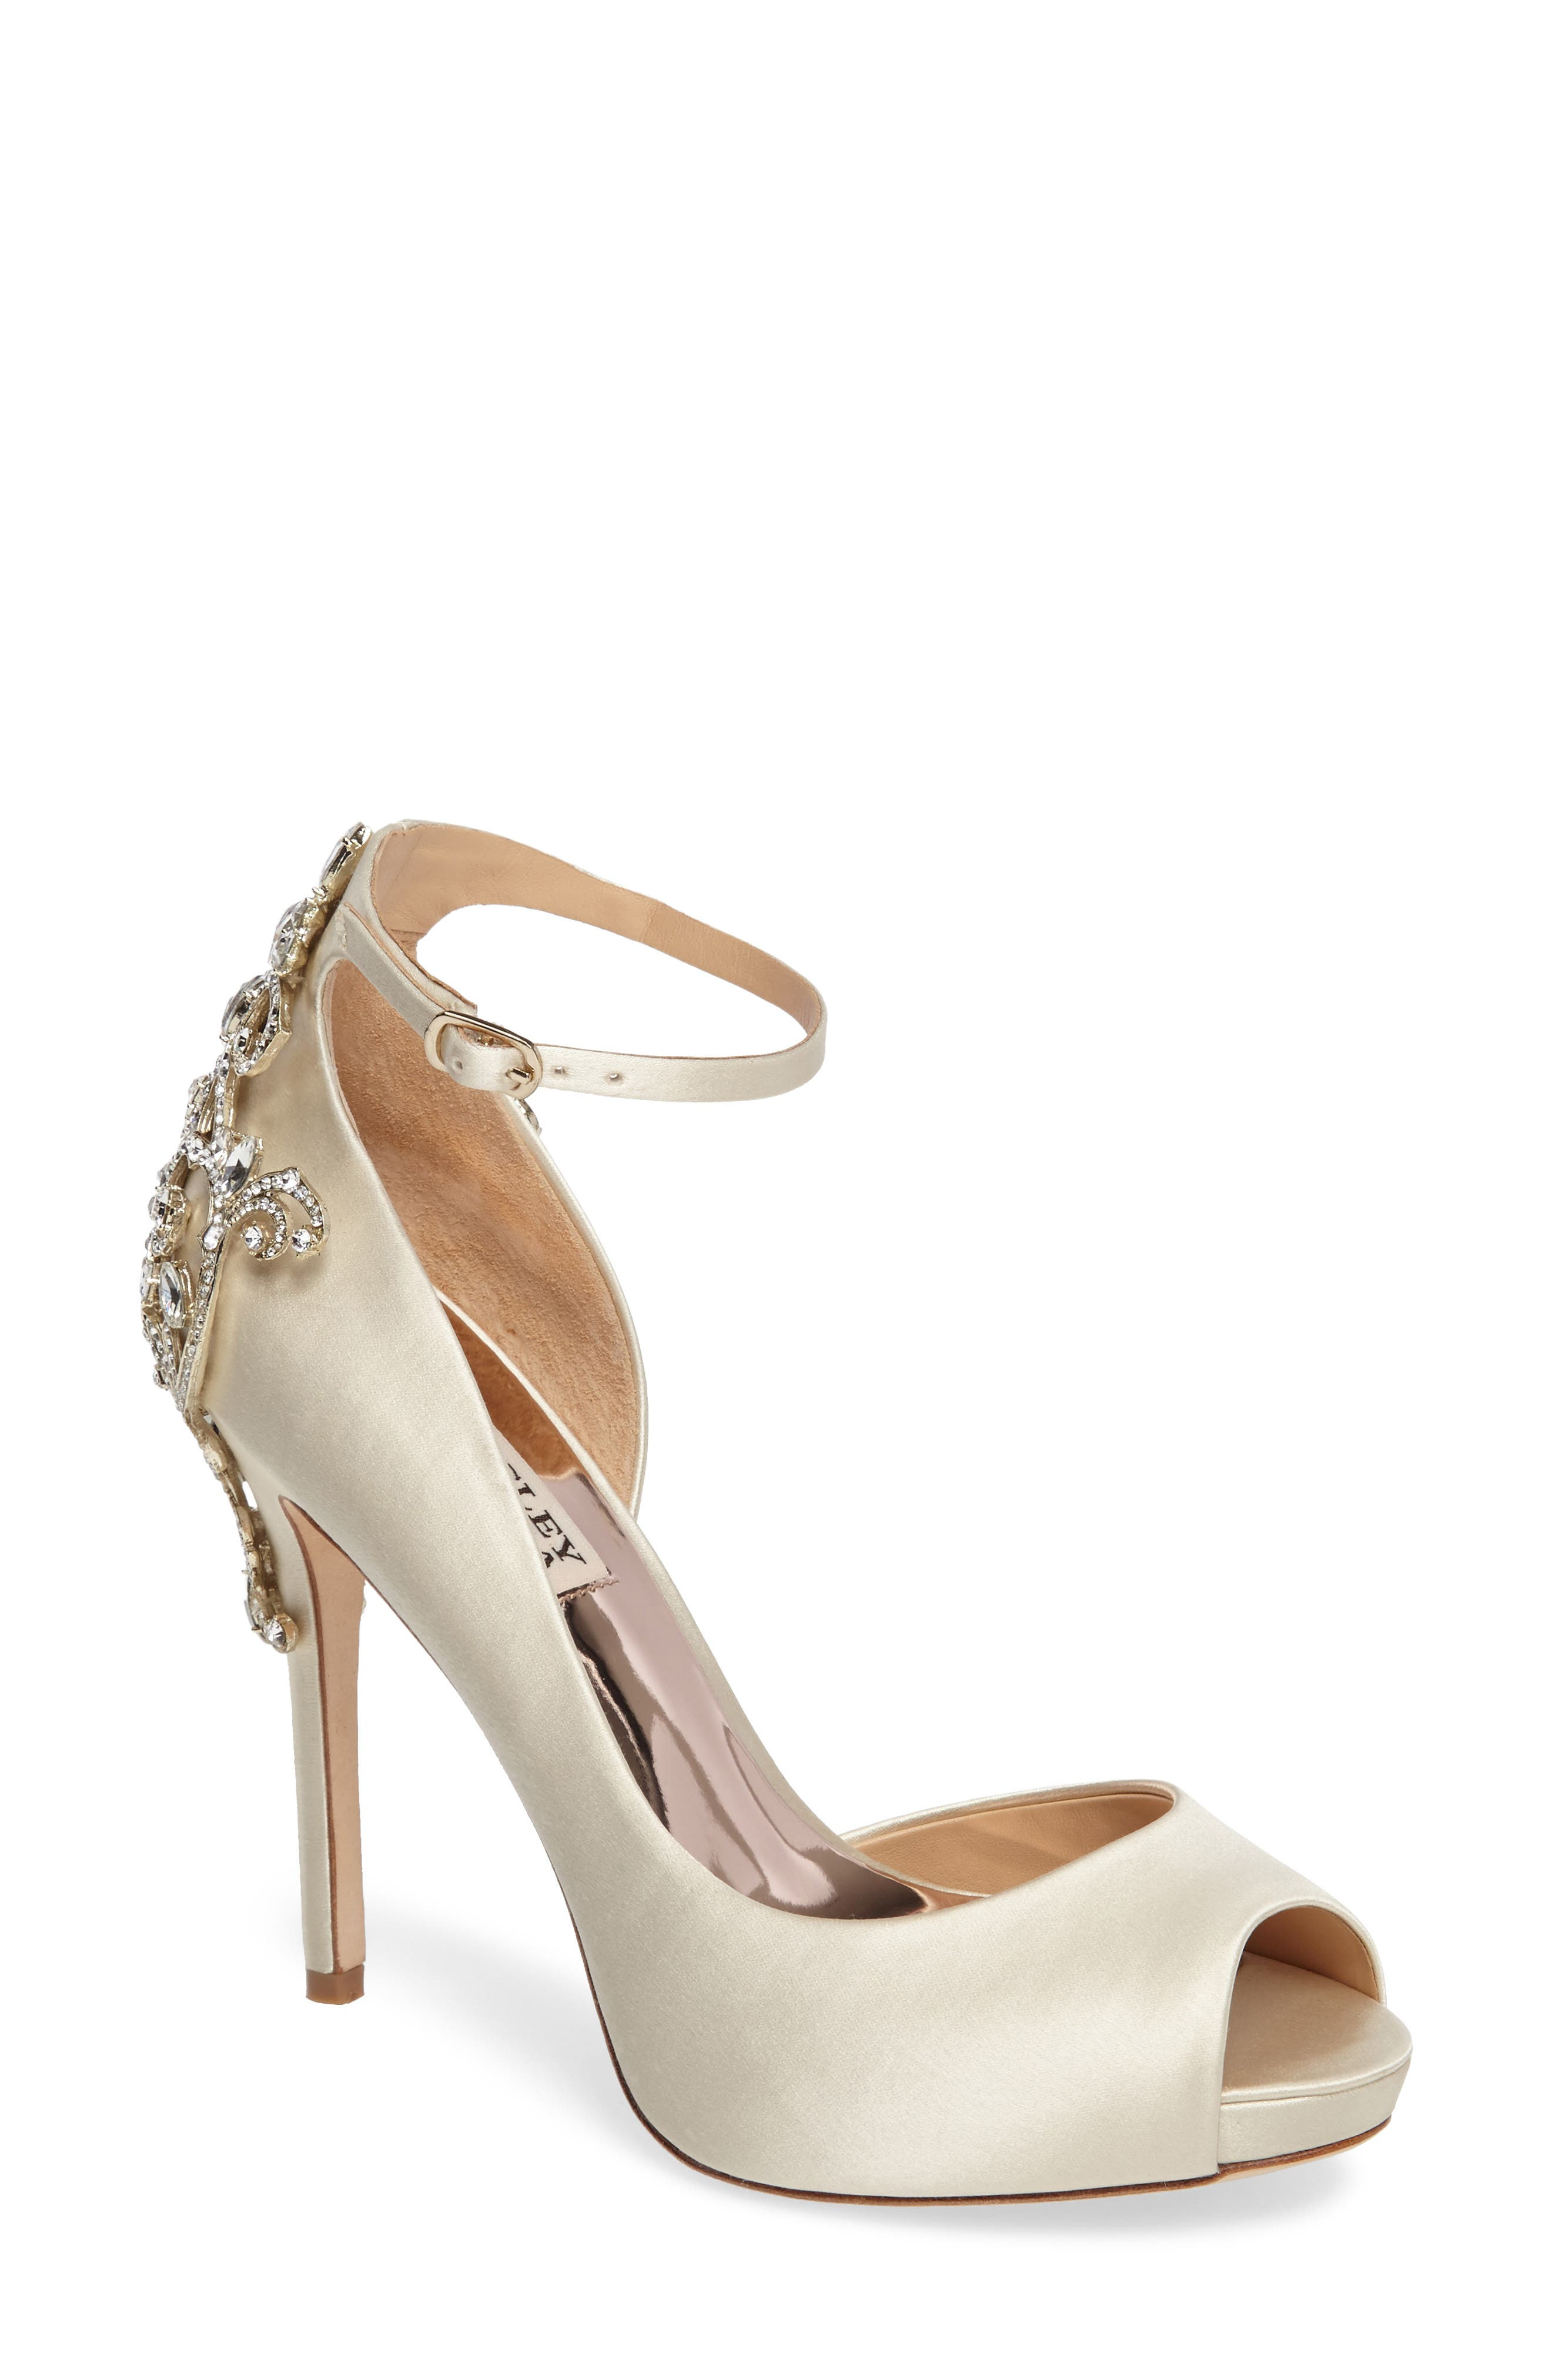 Badgley Micshka Karson Embellished Peep Toe Pump (Women)